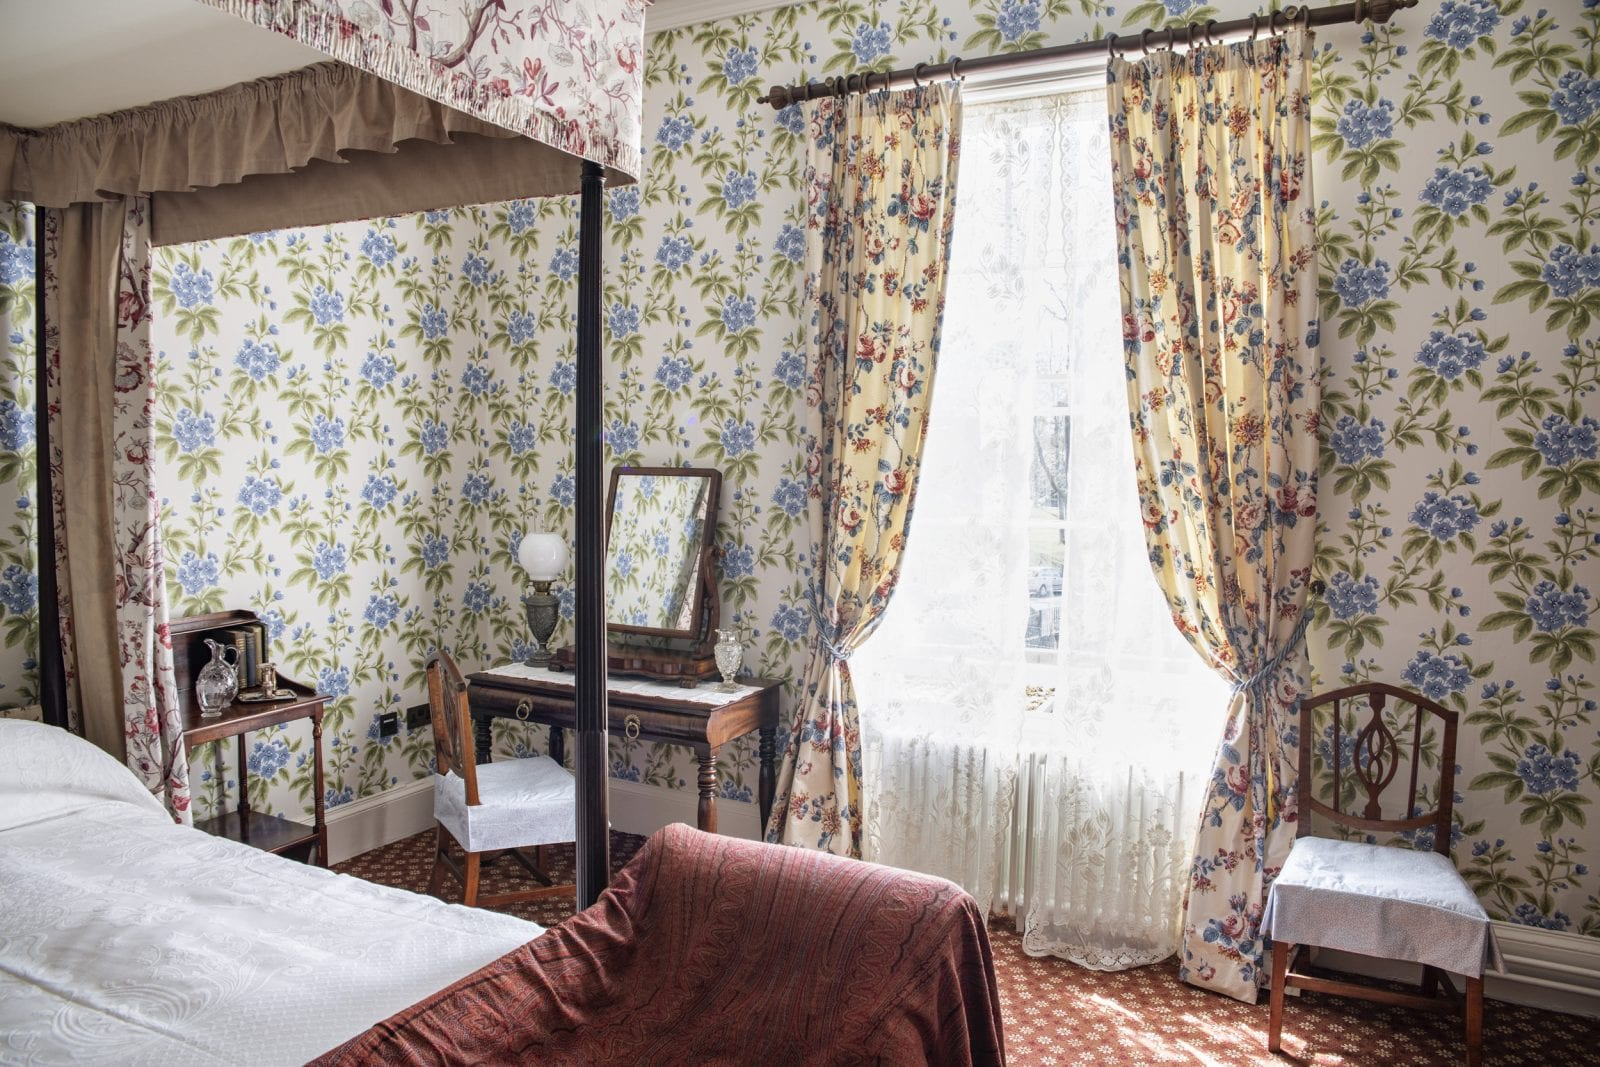 The historic regency villa sat between Longsight's terraces, The Manc